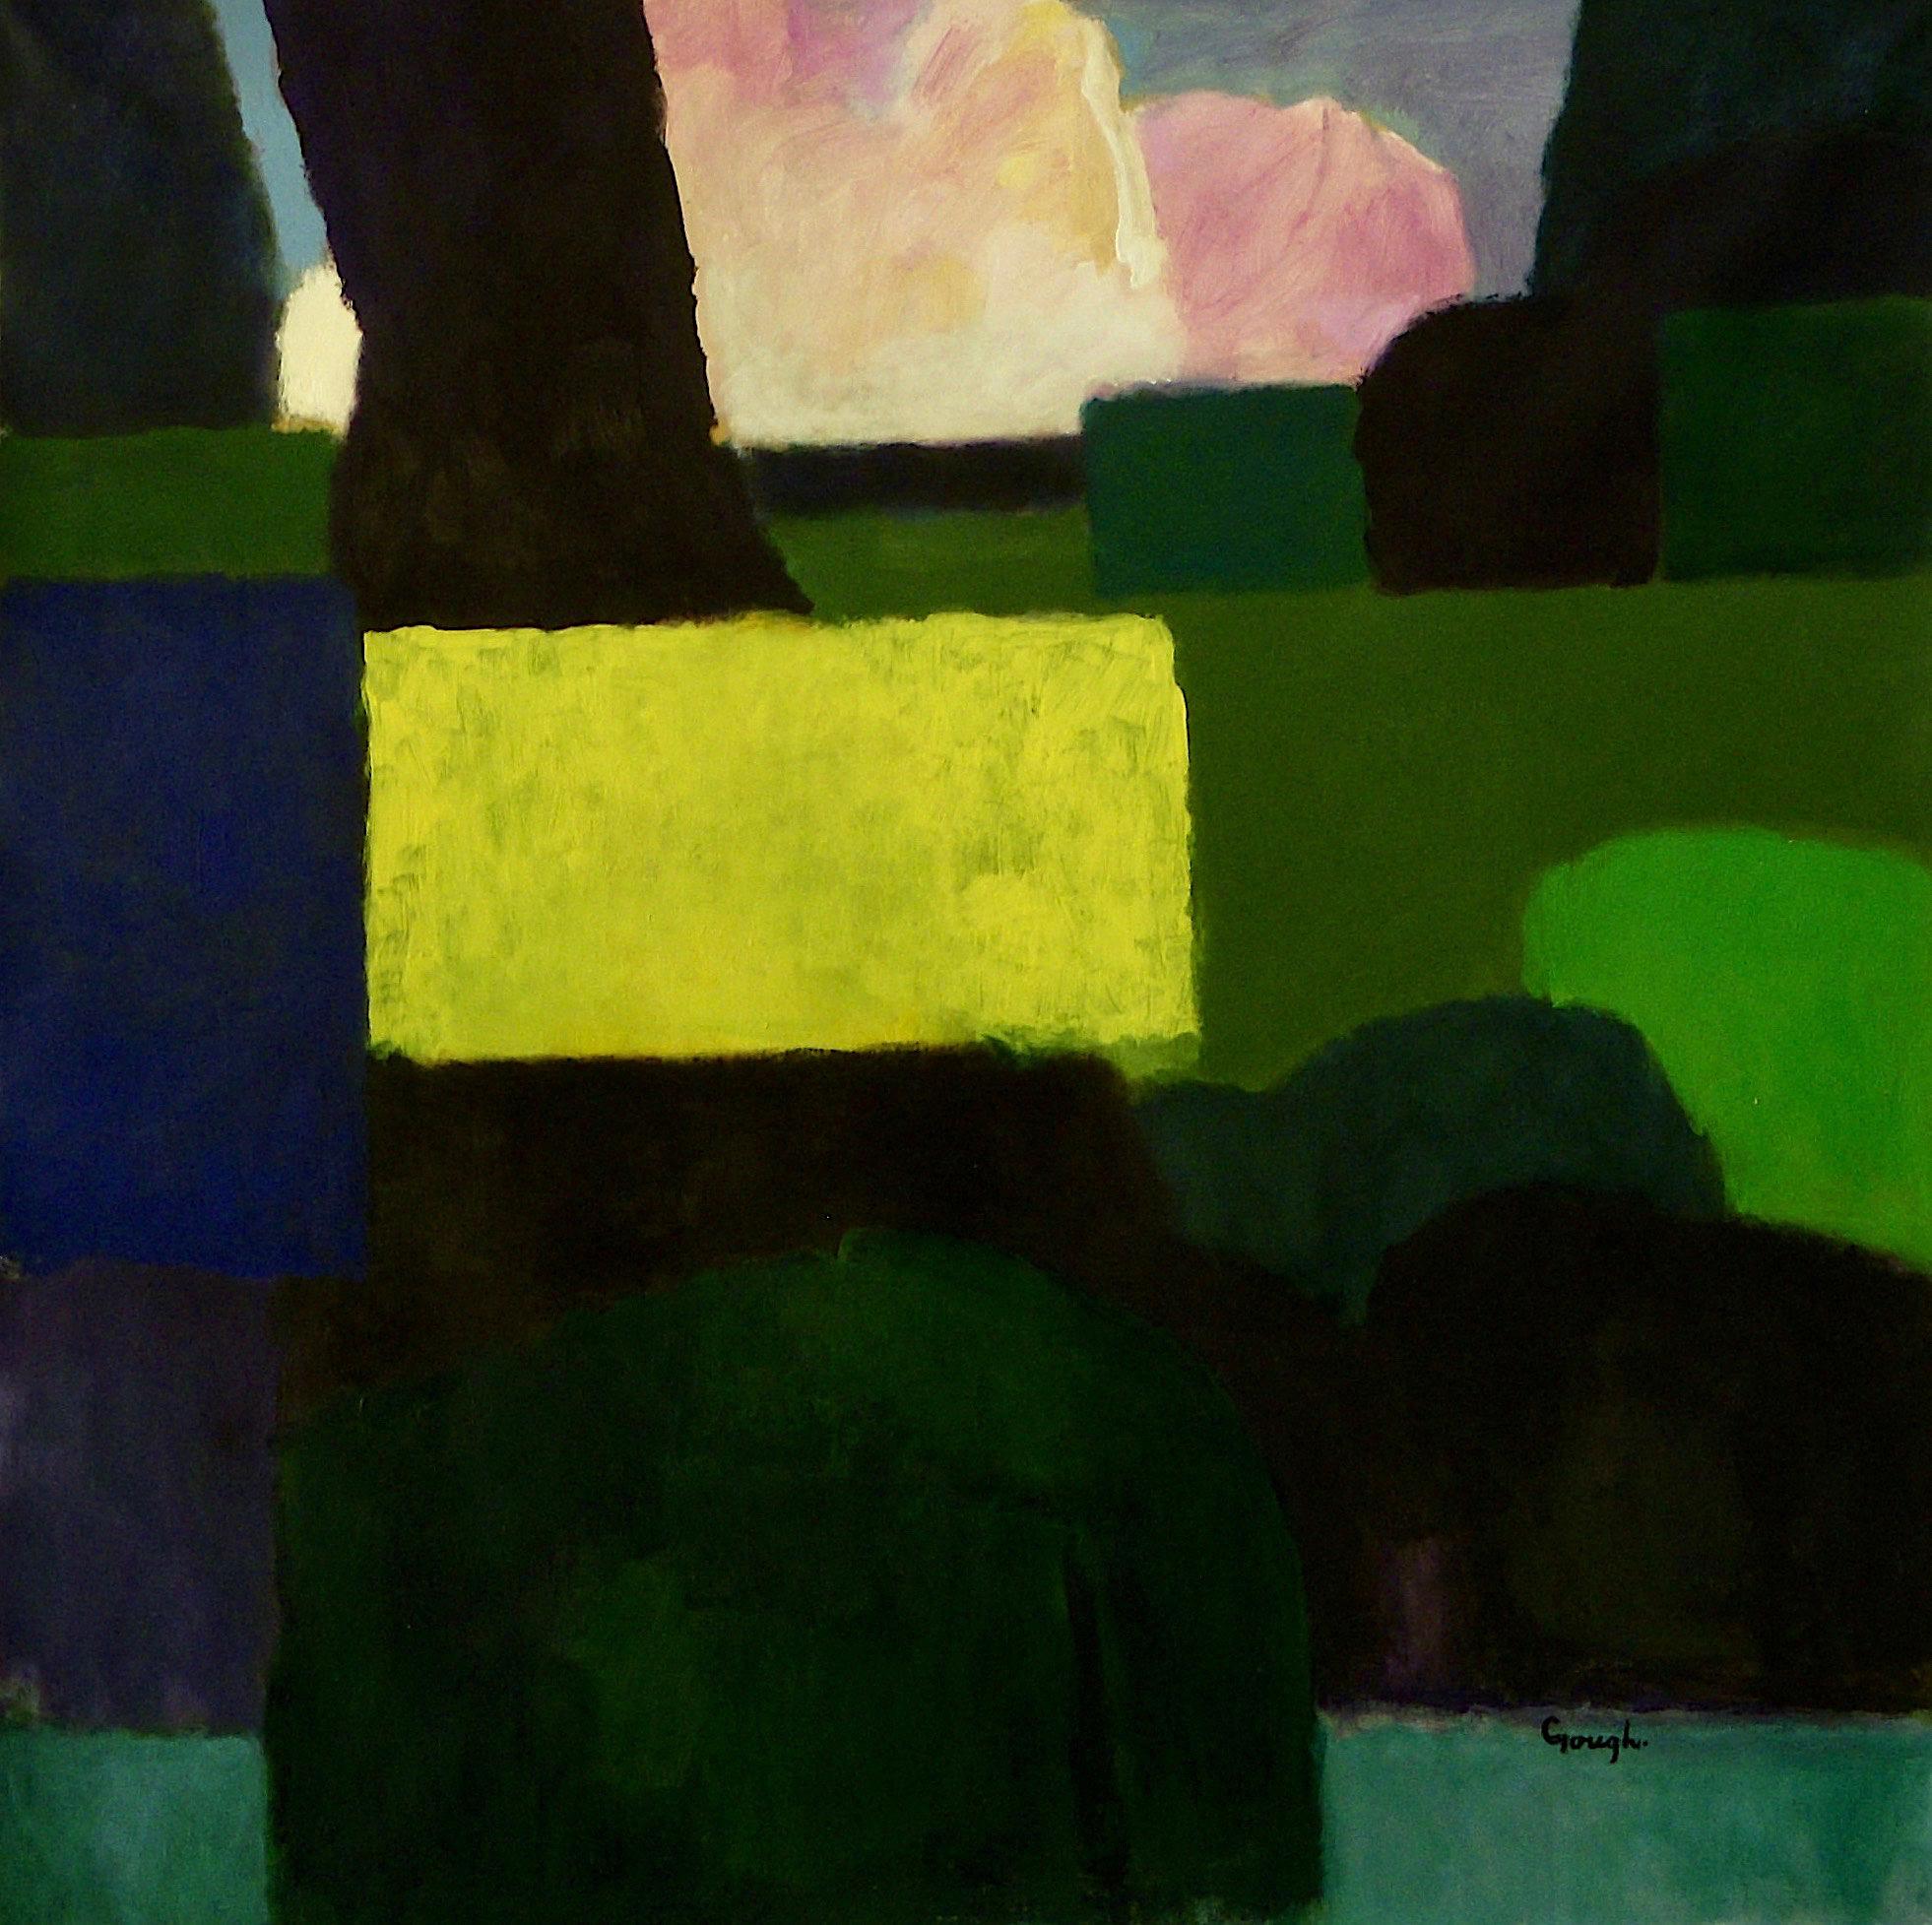 Craig Gough, 'Colour Dialogue With Yellow'. 2019. acrylic on canvas. 137x137cms $8000 - enquire